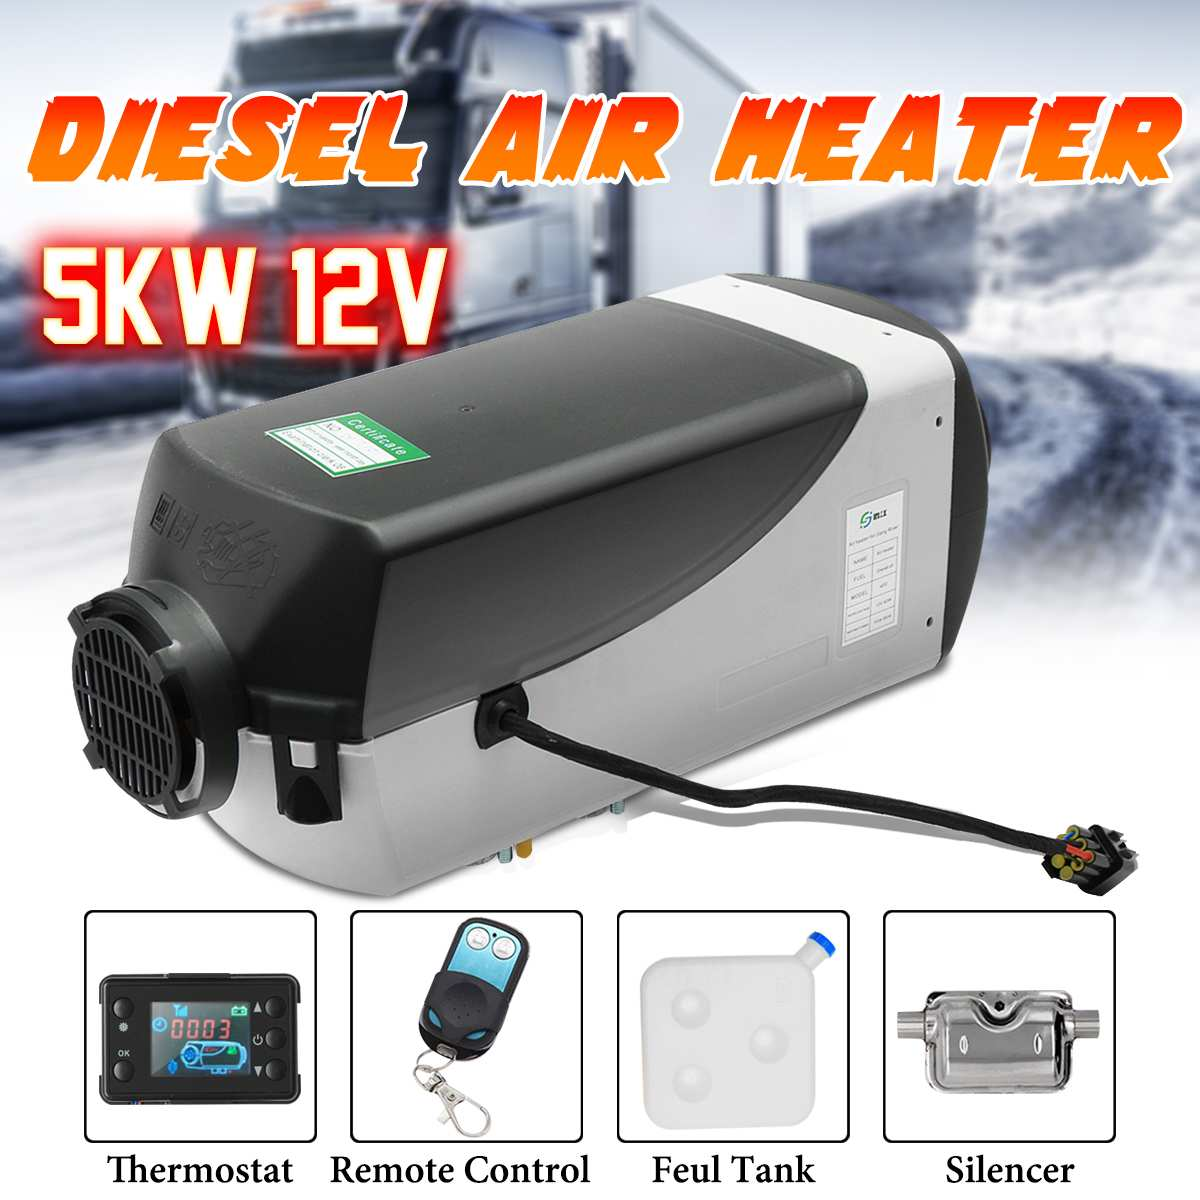 5kw 12 v diesels aquecedor de ar aquecedor de estacionamento com controle remoto monitor lcd carro aquecedor silenciador para livre